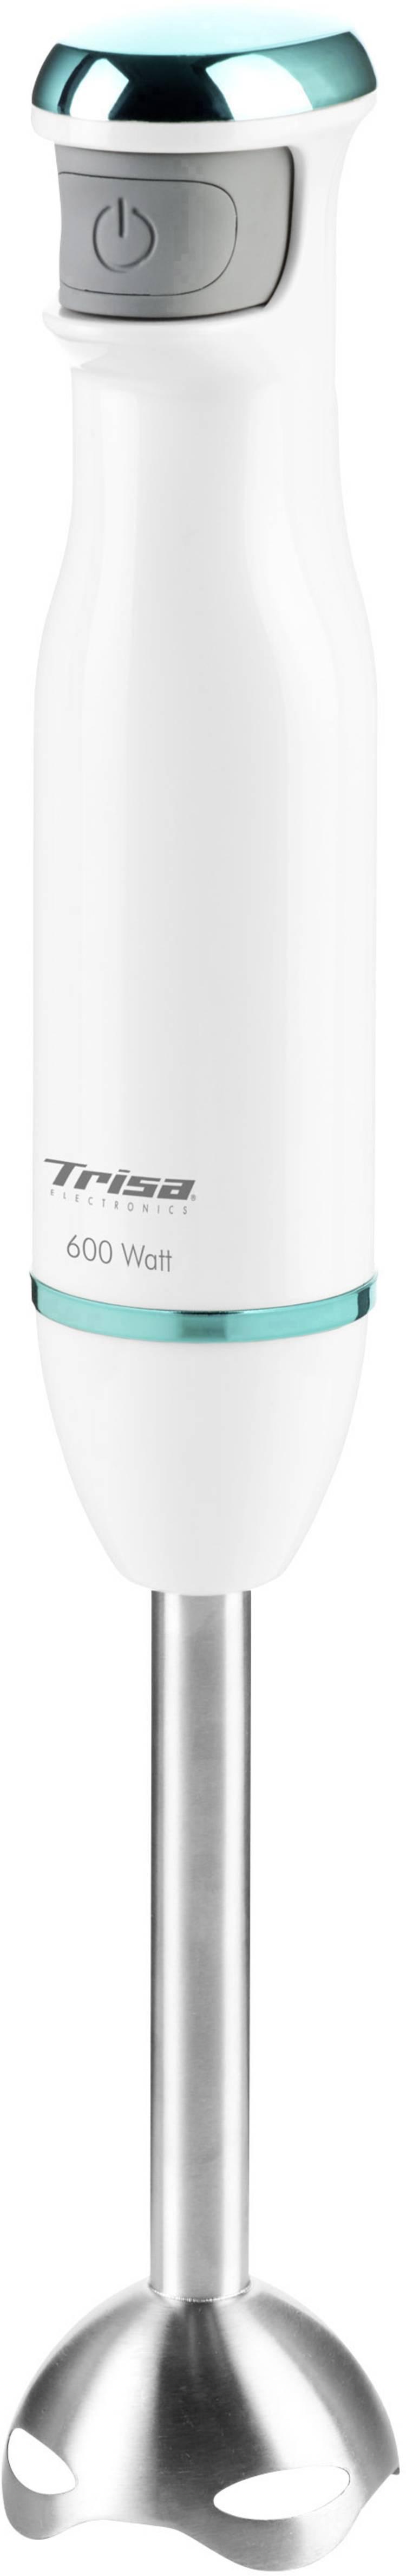 Trisa Quick Mix 600 W Wit. Turquoise